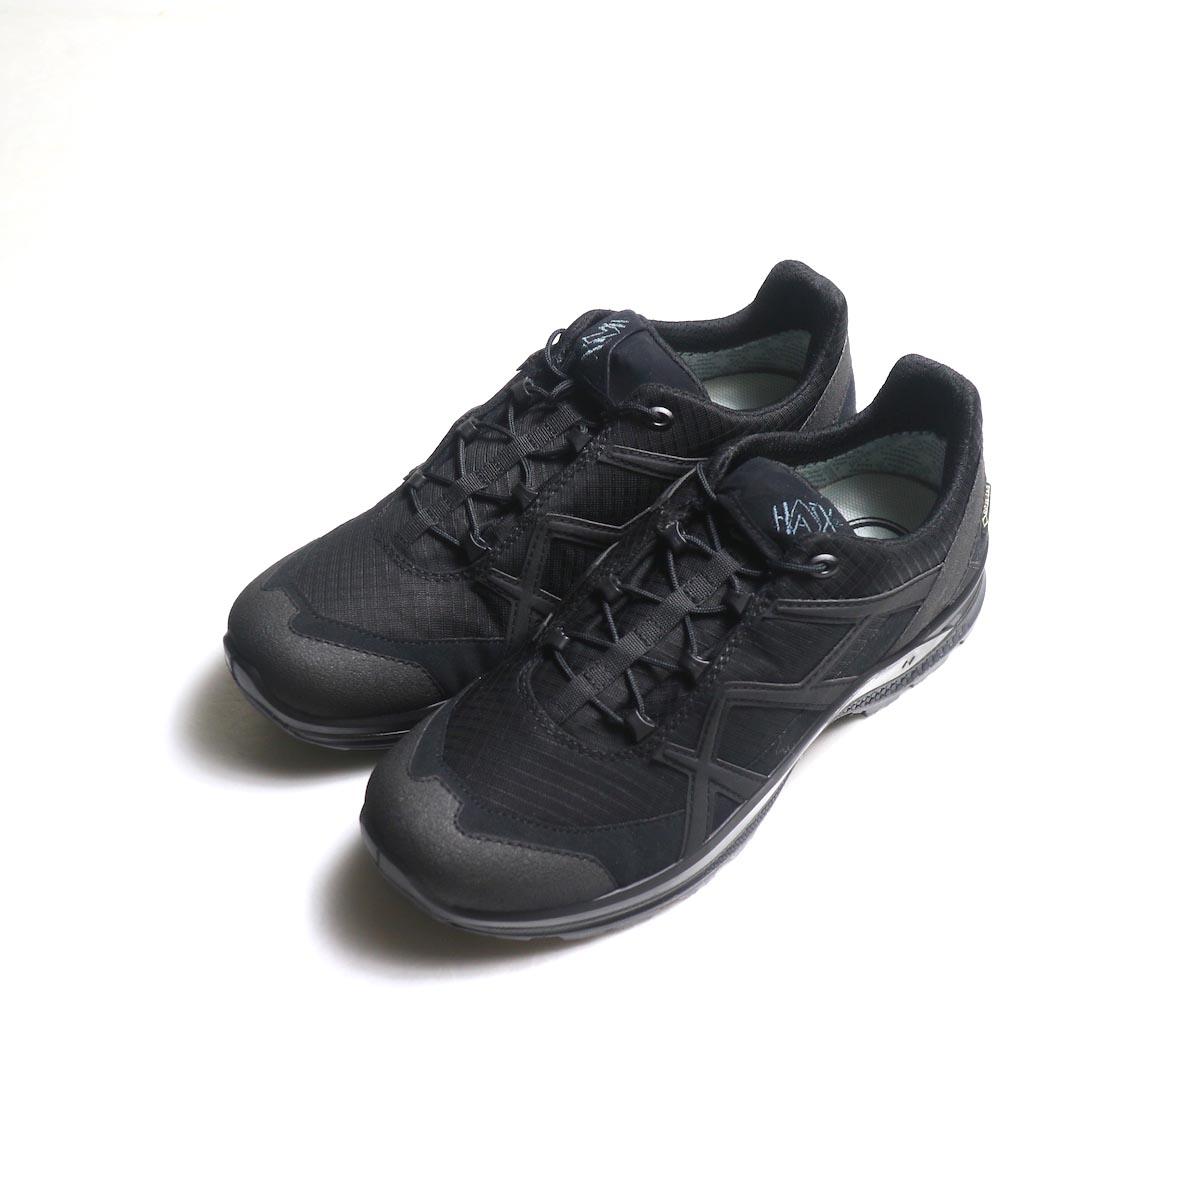 HAIX / BLACK EAGLE - ATHLETIC 2.1 GTX LOW (Black)